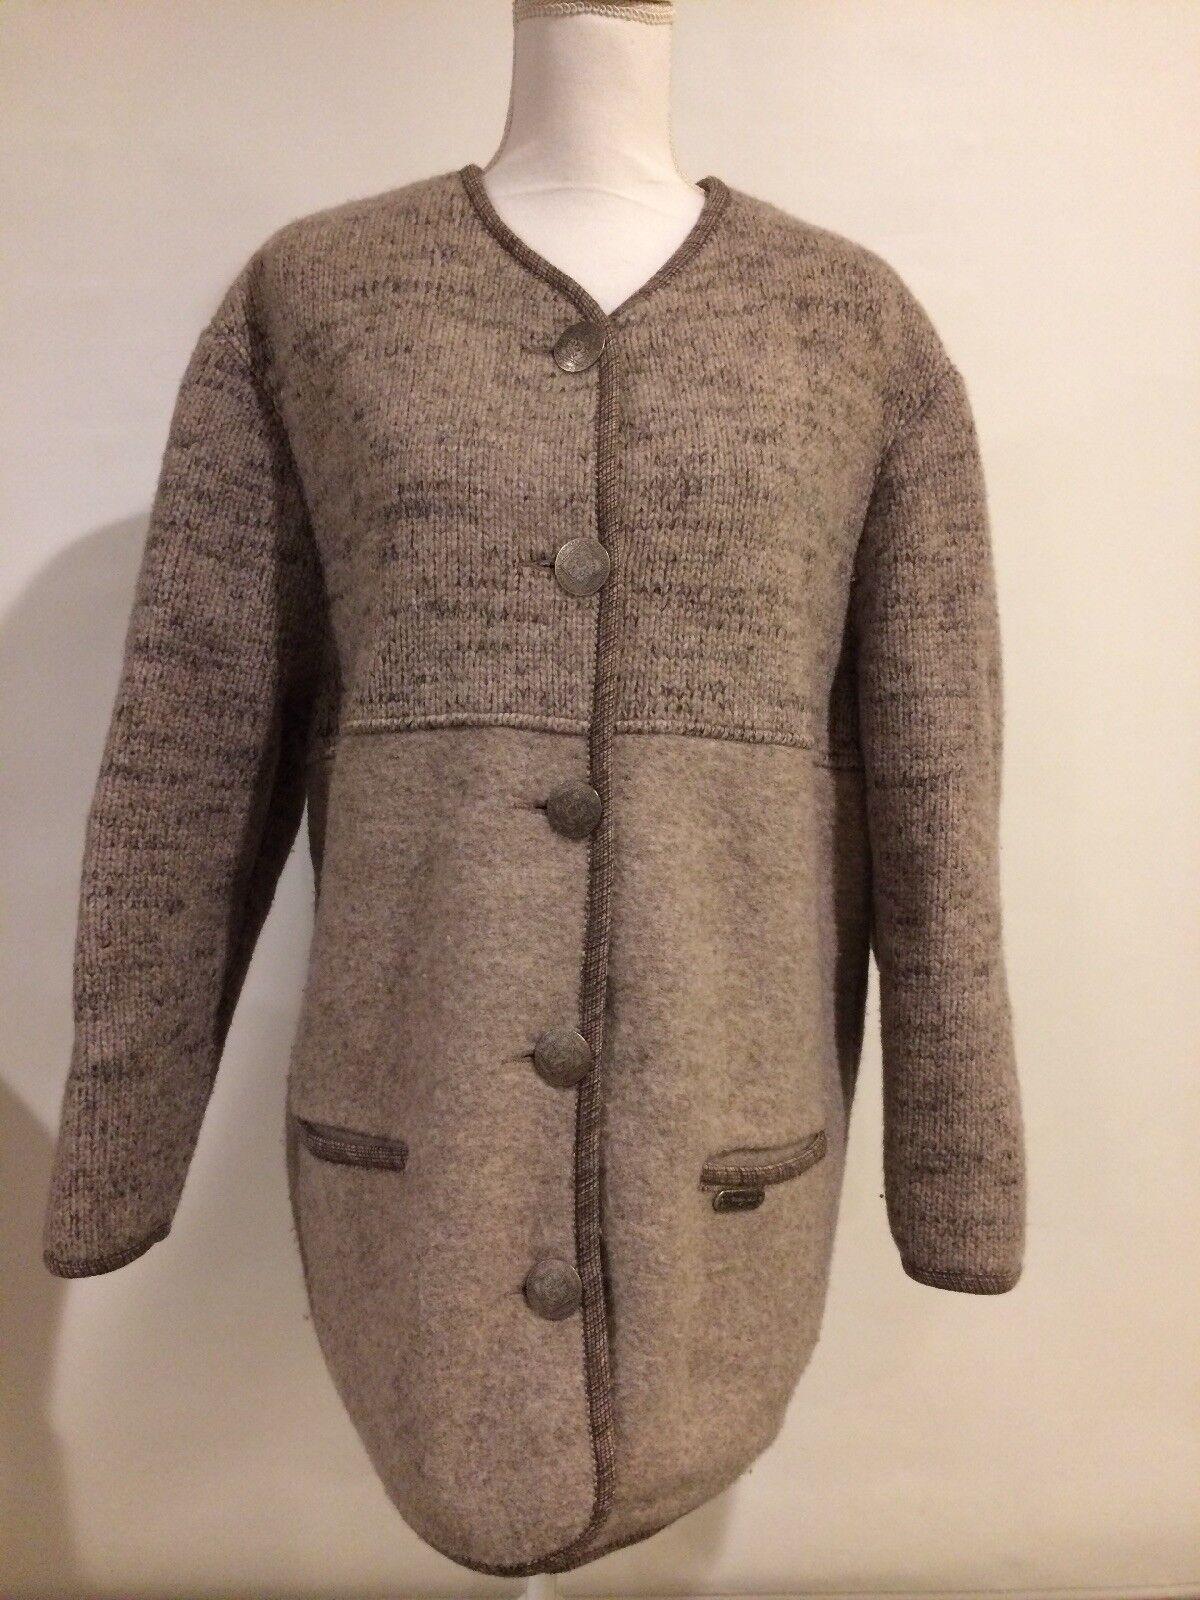 Wesenjak Tirol Beige Pure Wool Button Front Austrian Cardigan Sweater Sz US 12